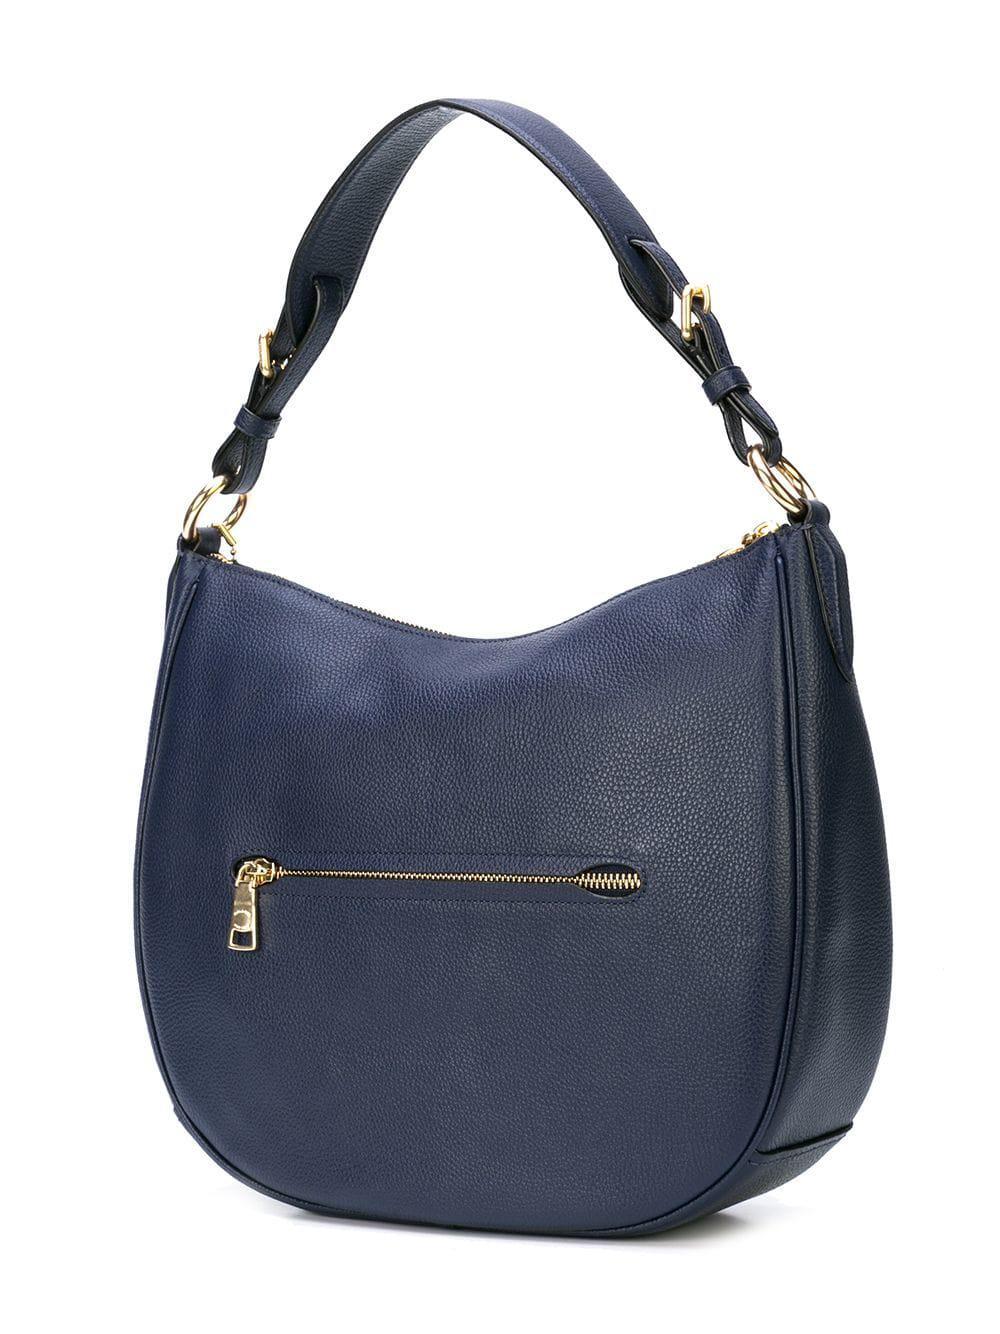 17bb51949b3 COACH Sutton Hobo Bag in Blue - Lyst